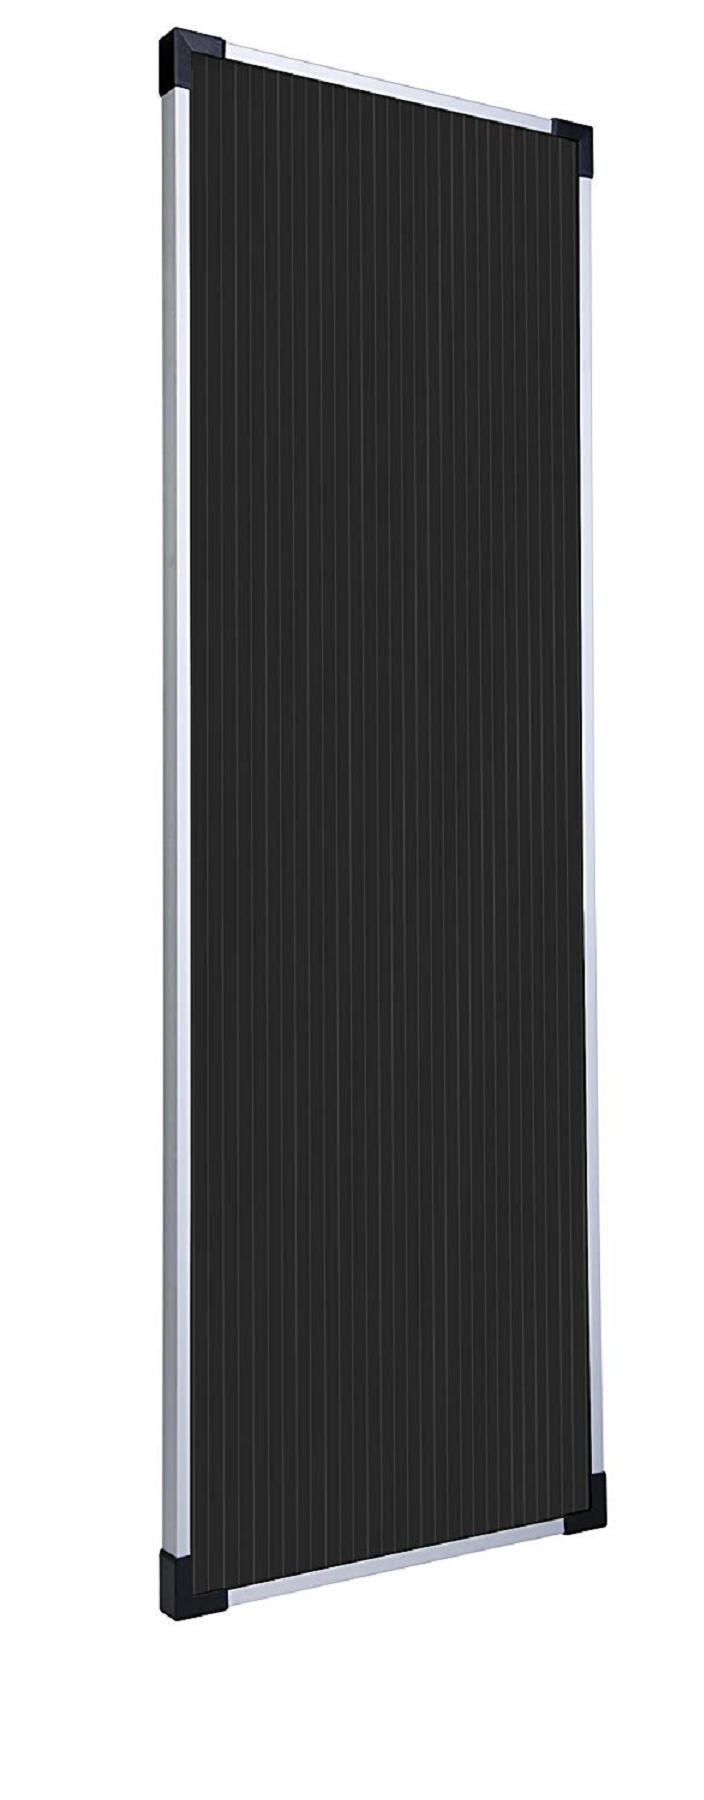 15 Watt thin-film solar panel